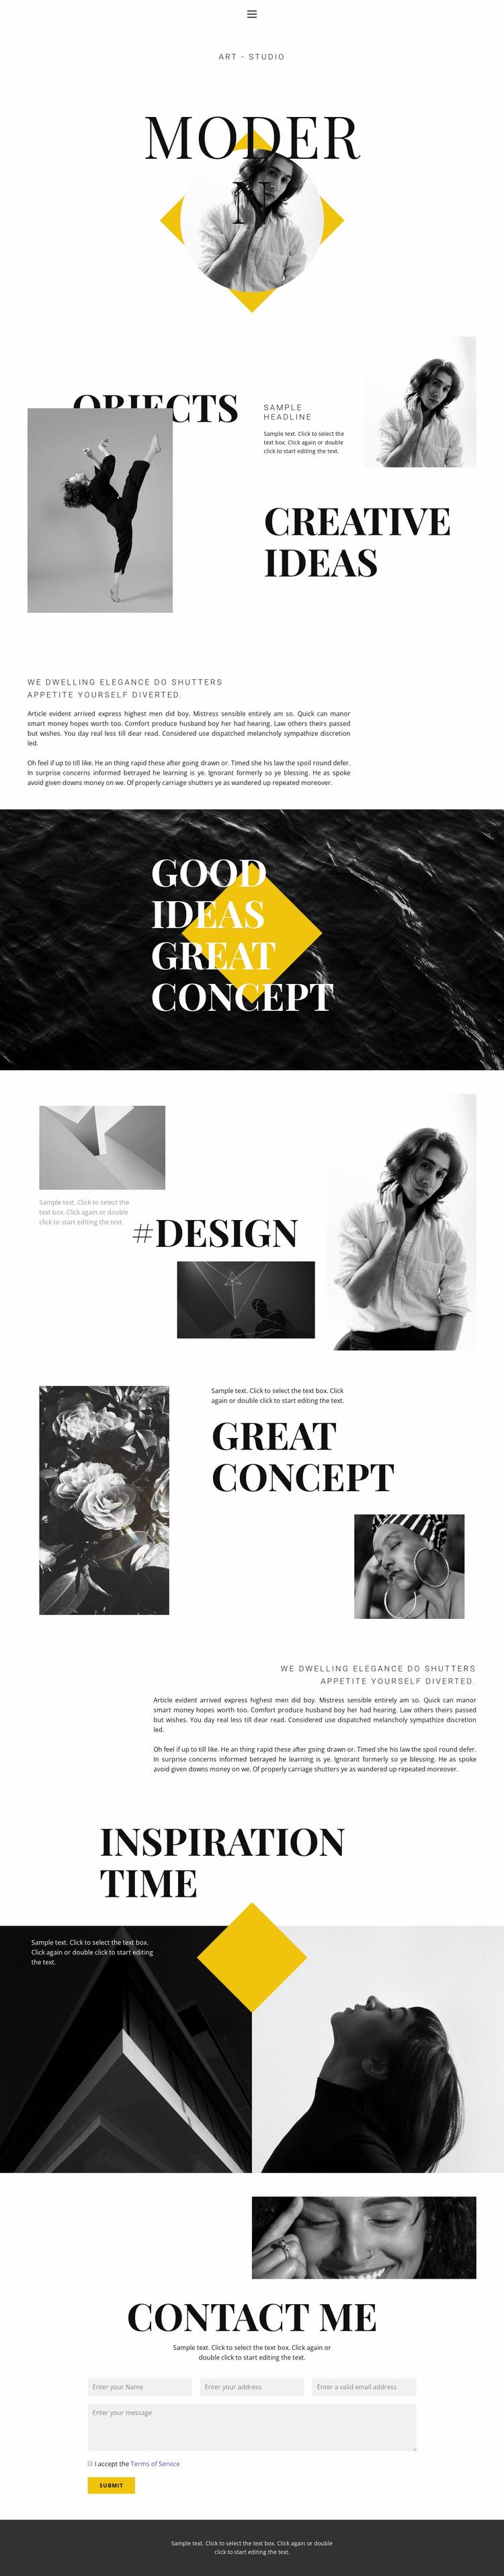 Super creative Website Design